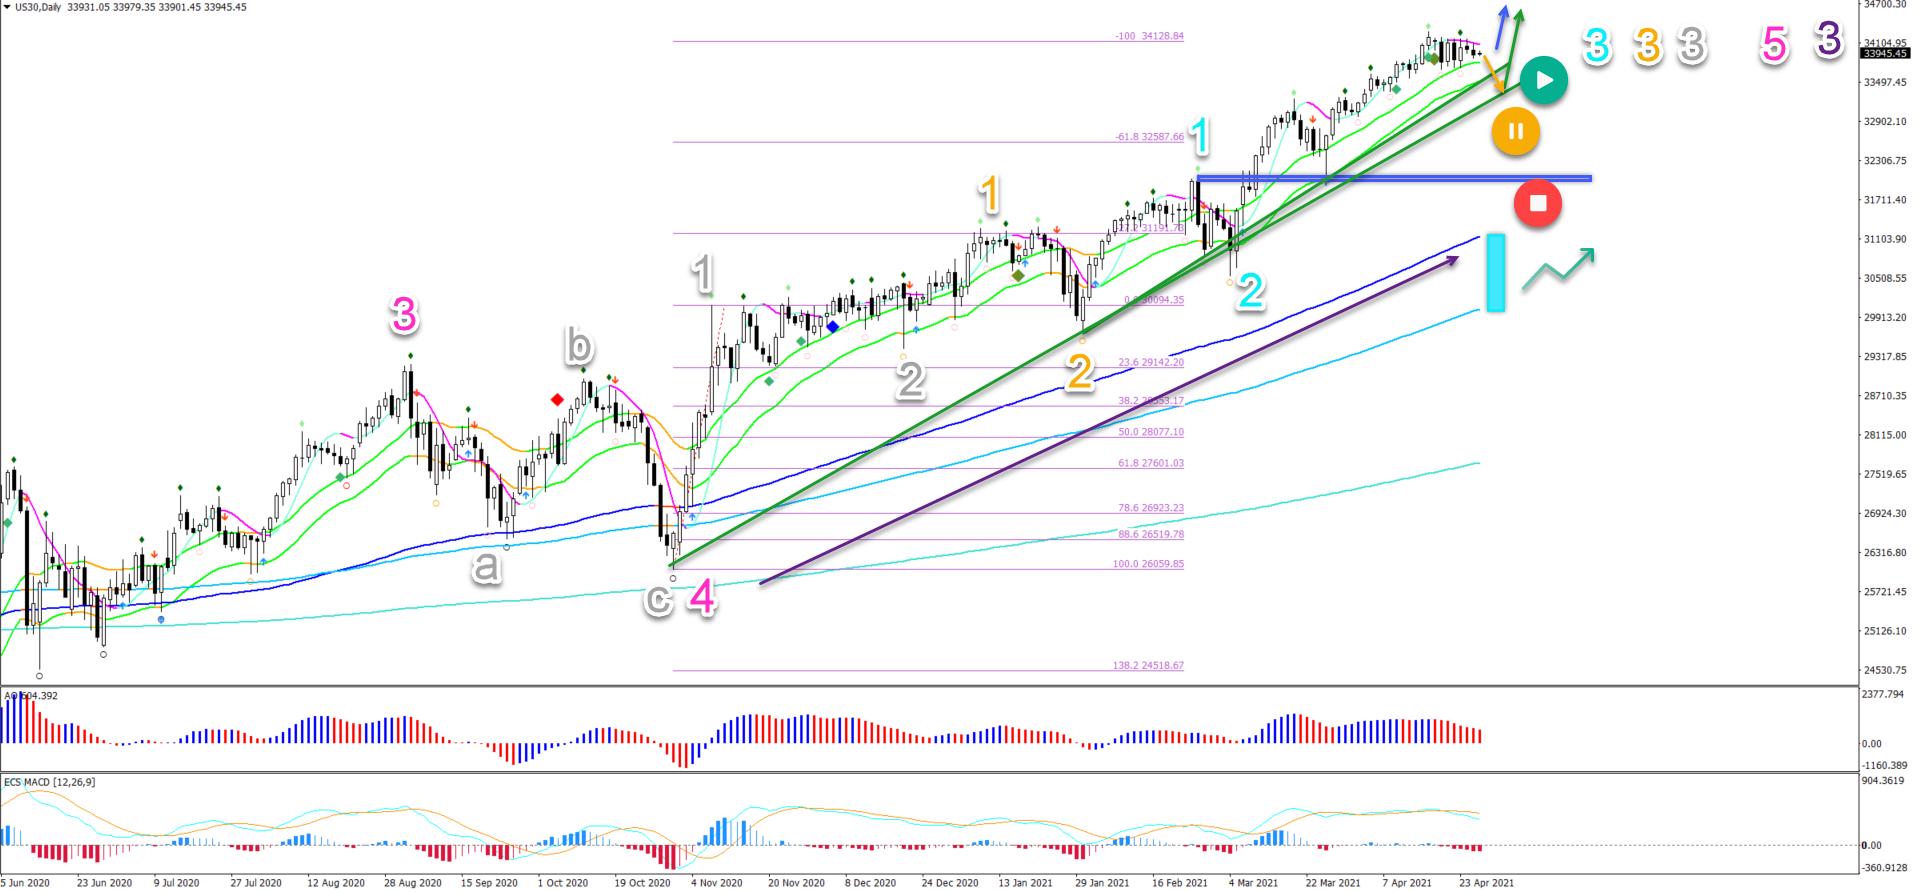 Dow Jones 28.04.2021 daily chart